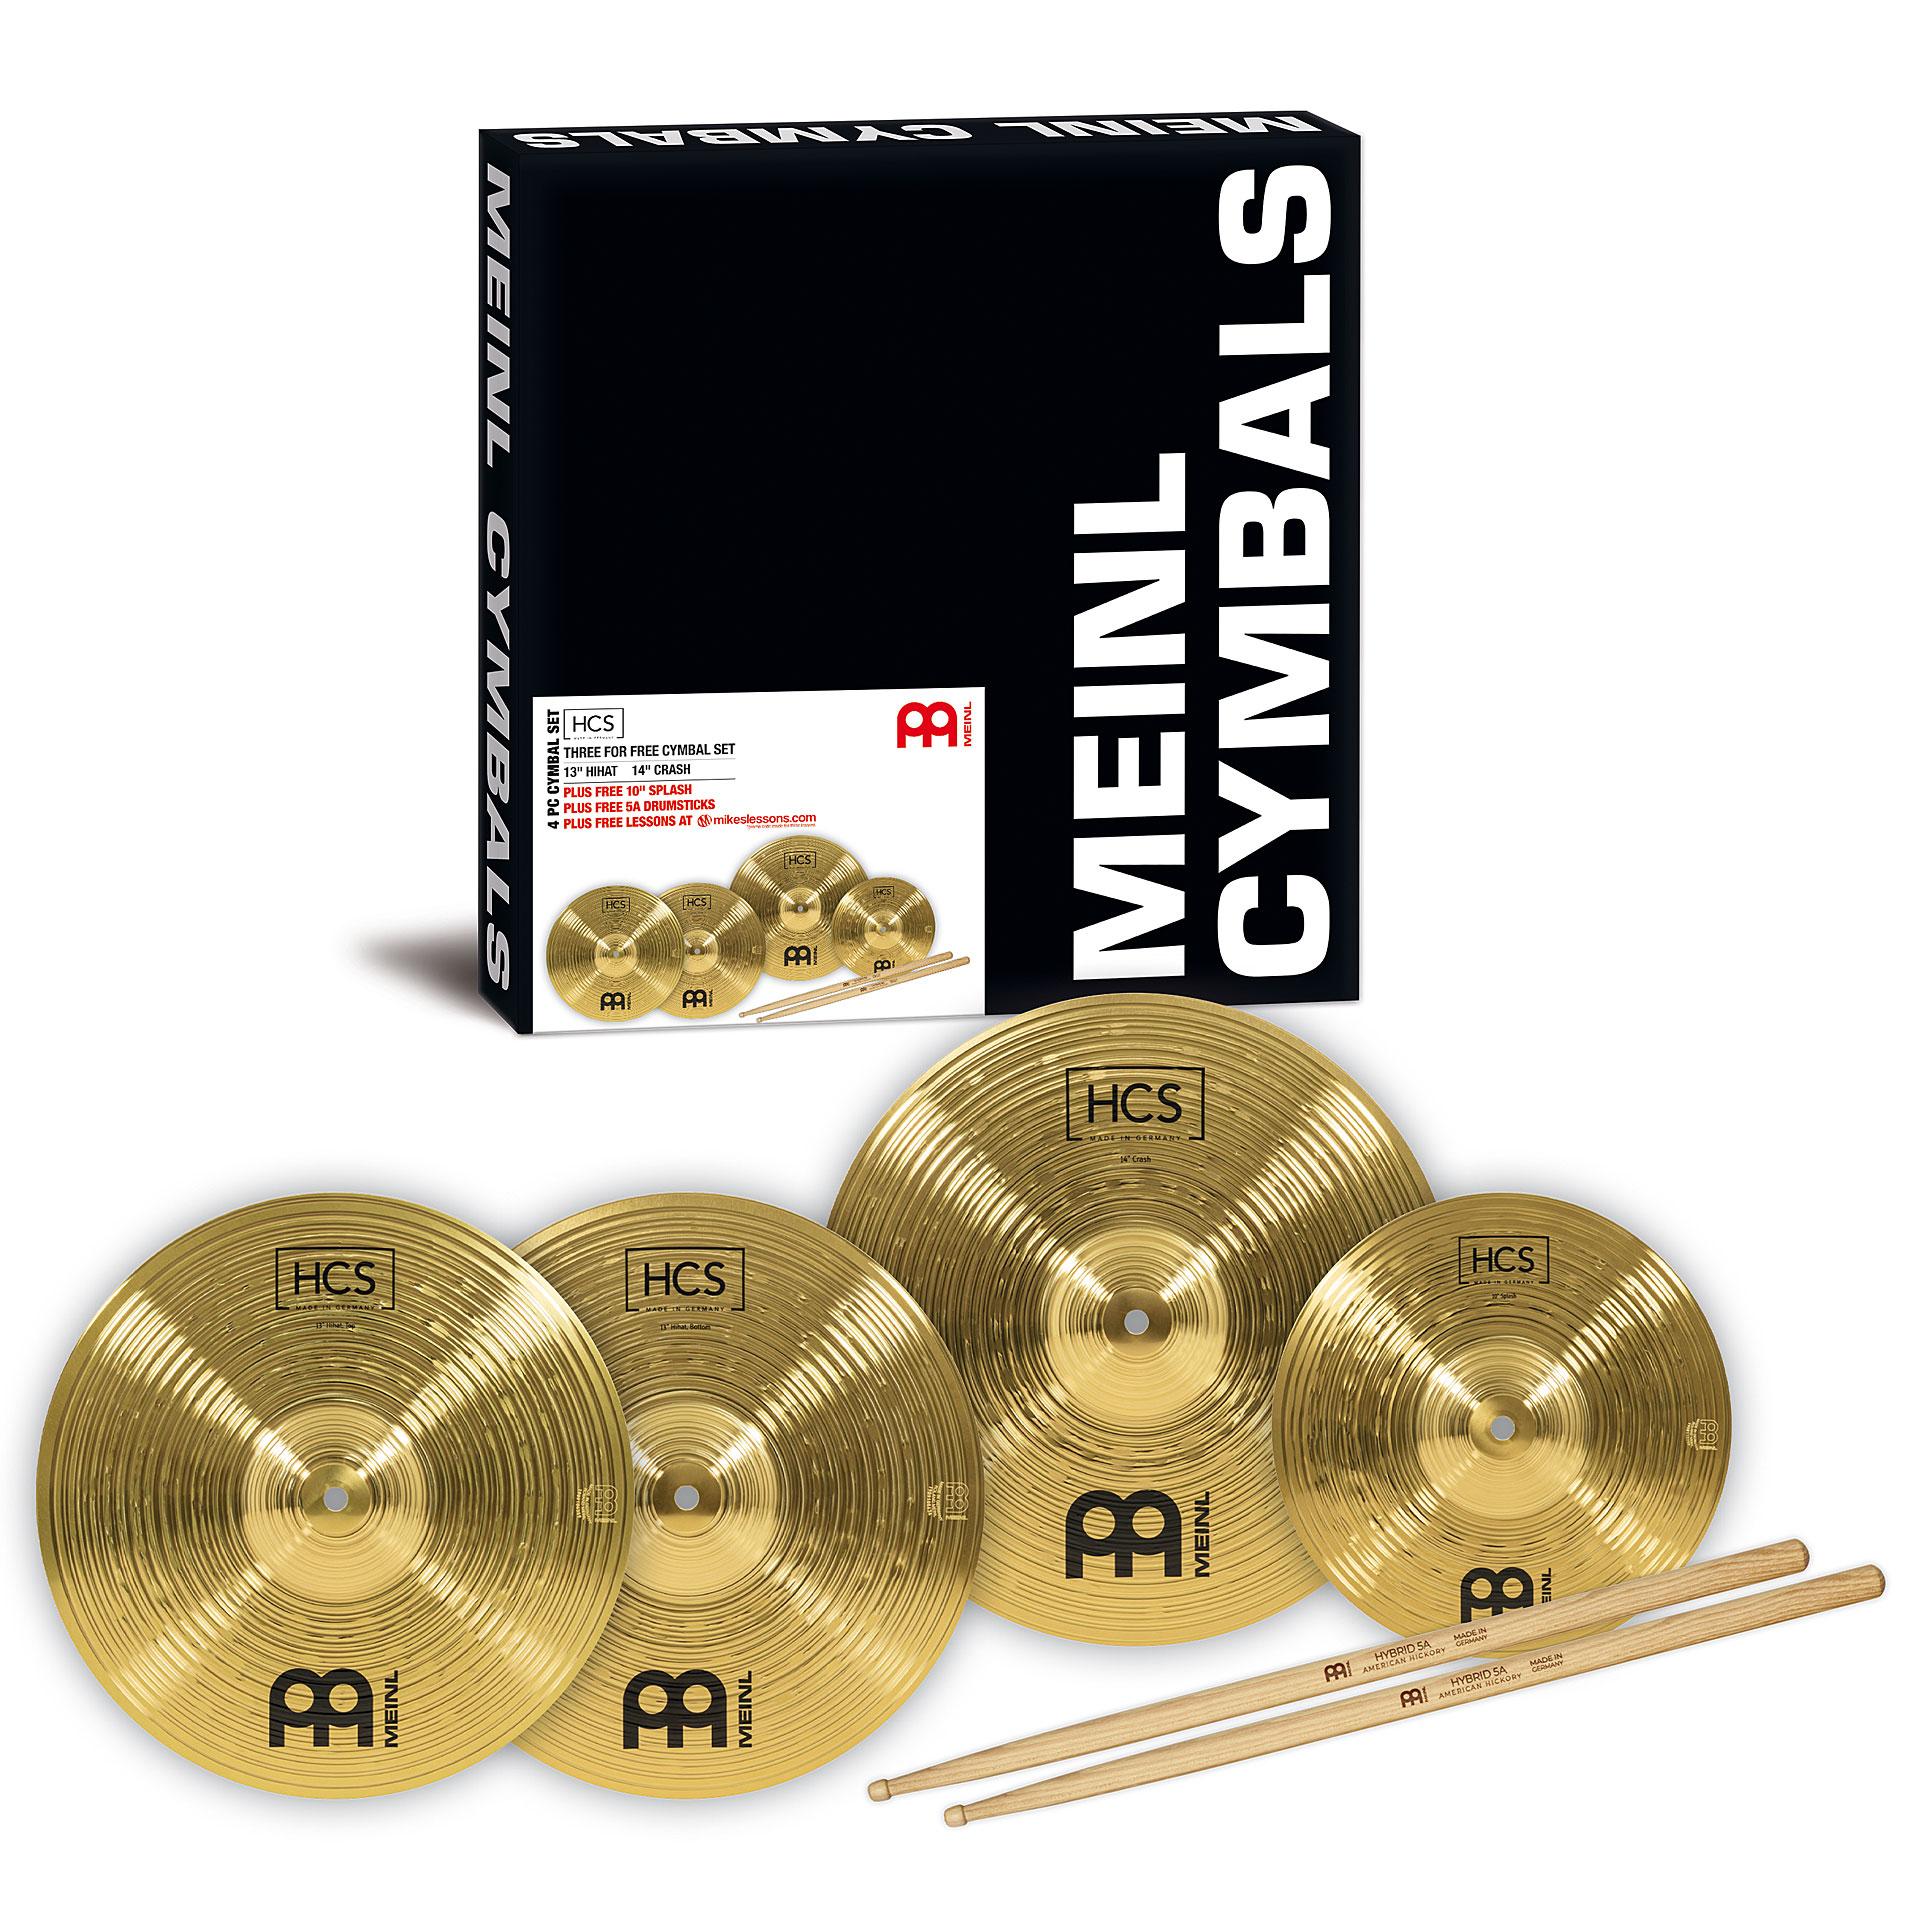 Meinl Hybrid 5A Hickory Drumsticks